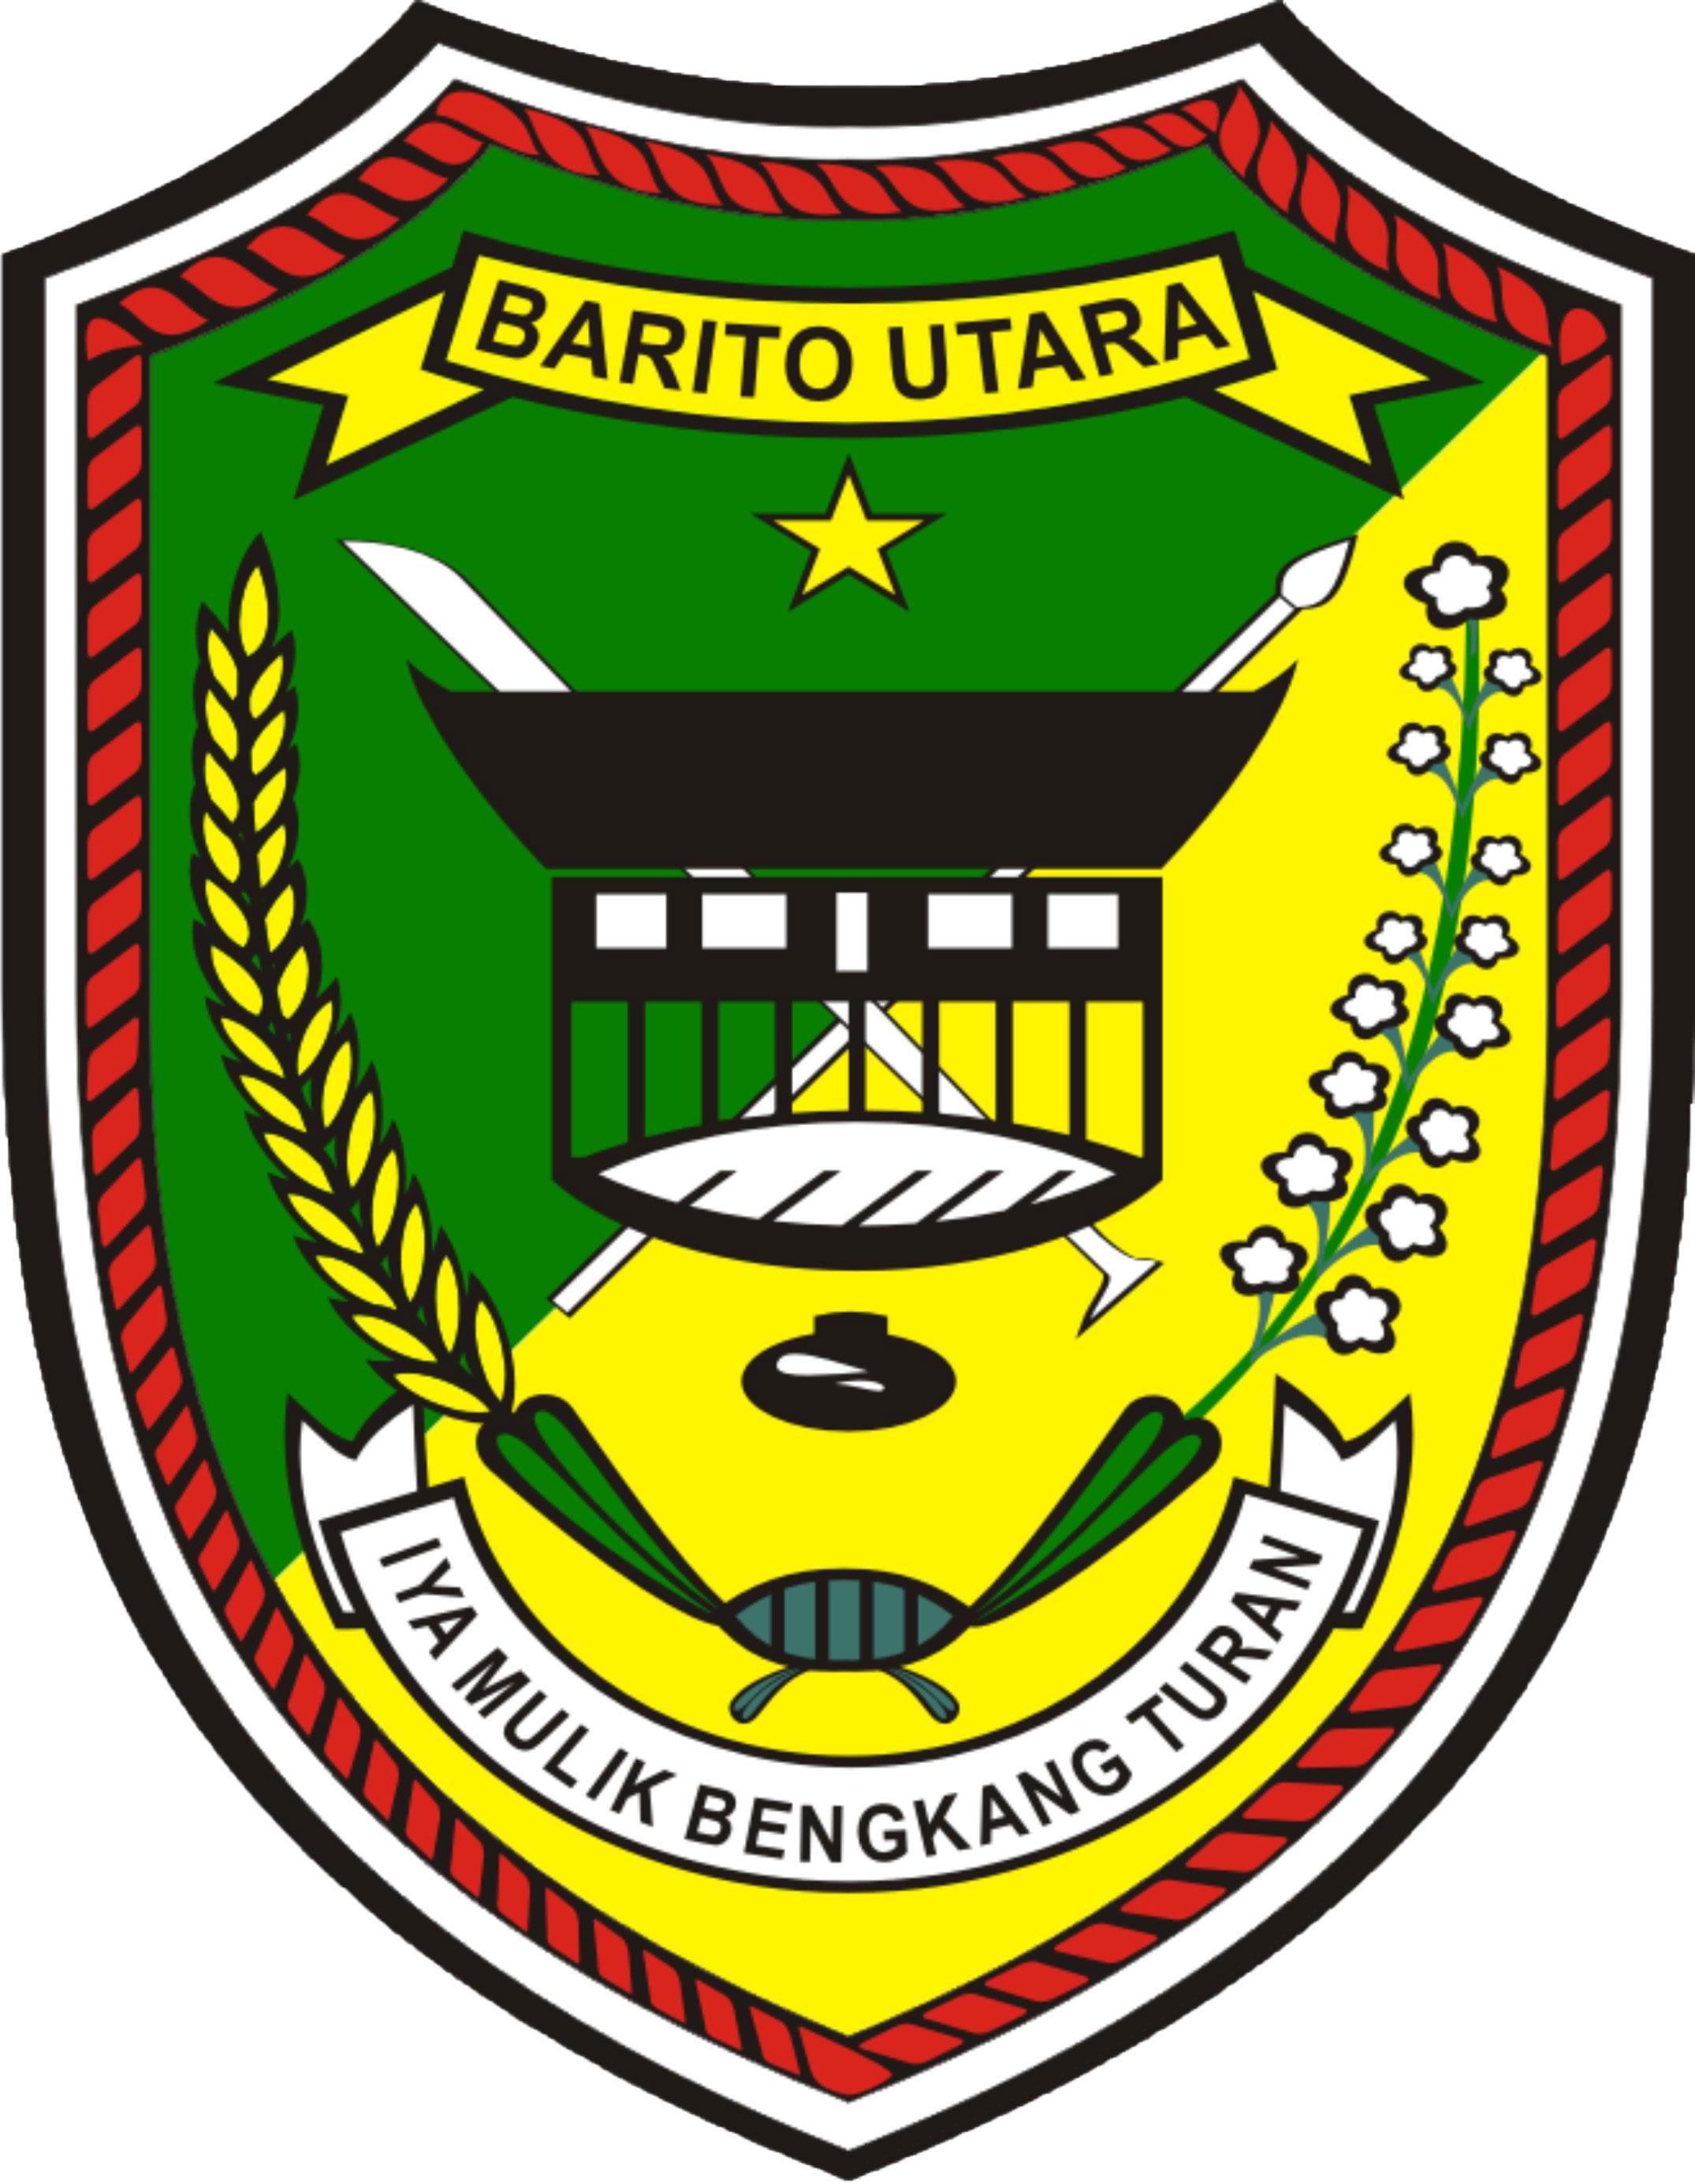 Arti Lambang Kabupaten Barito Utara Pena Aisya Blog